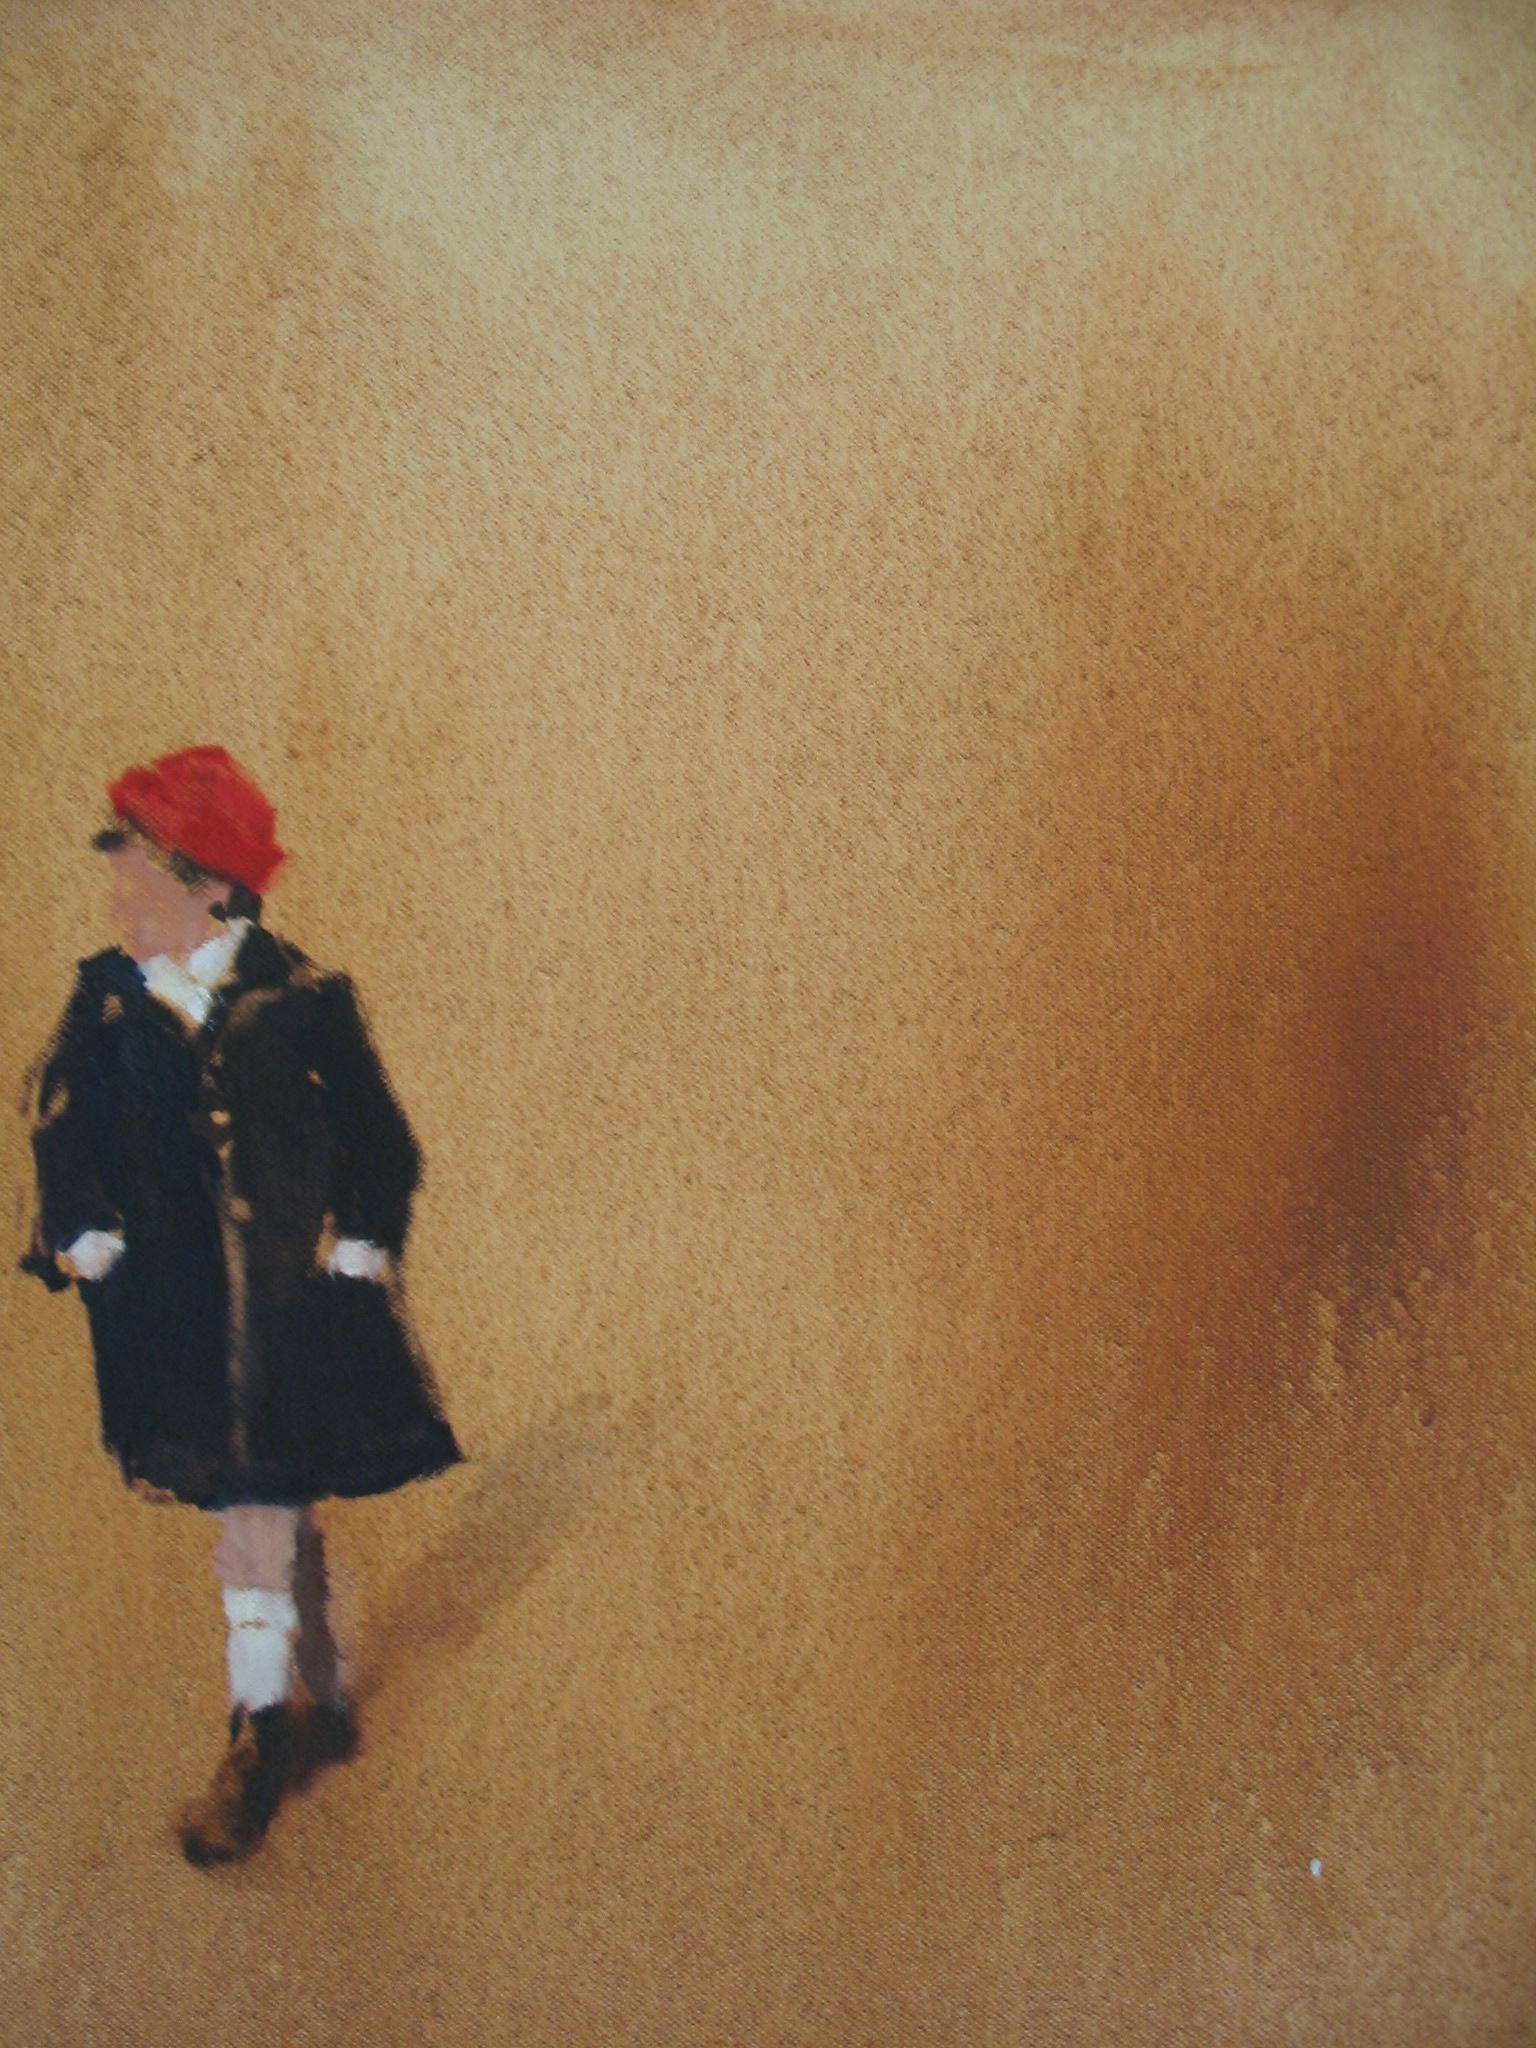 Hush (red hat) 2004